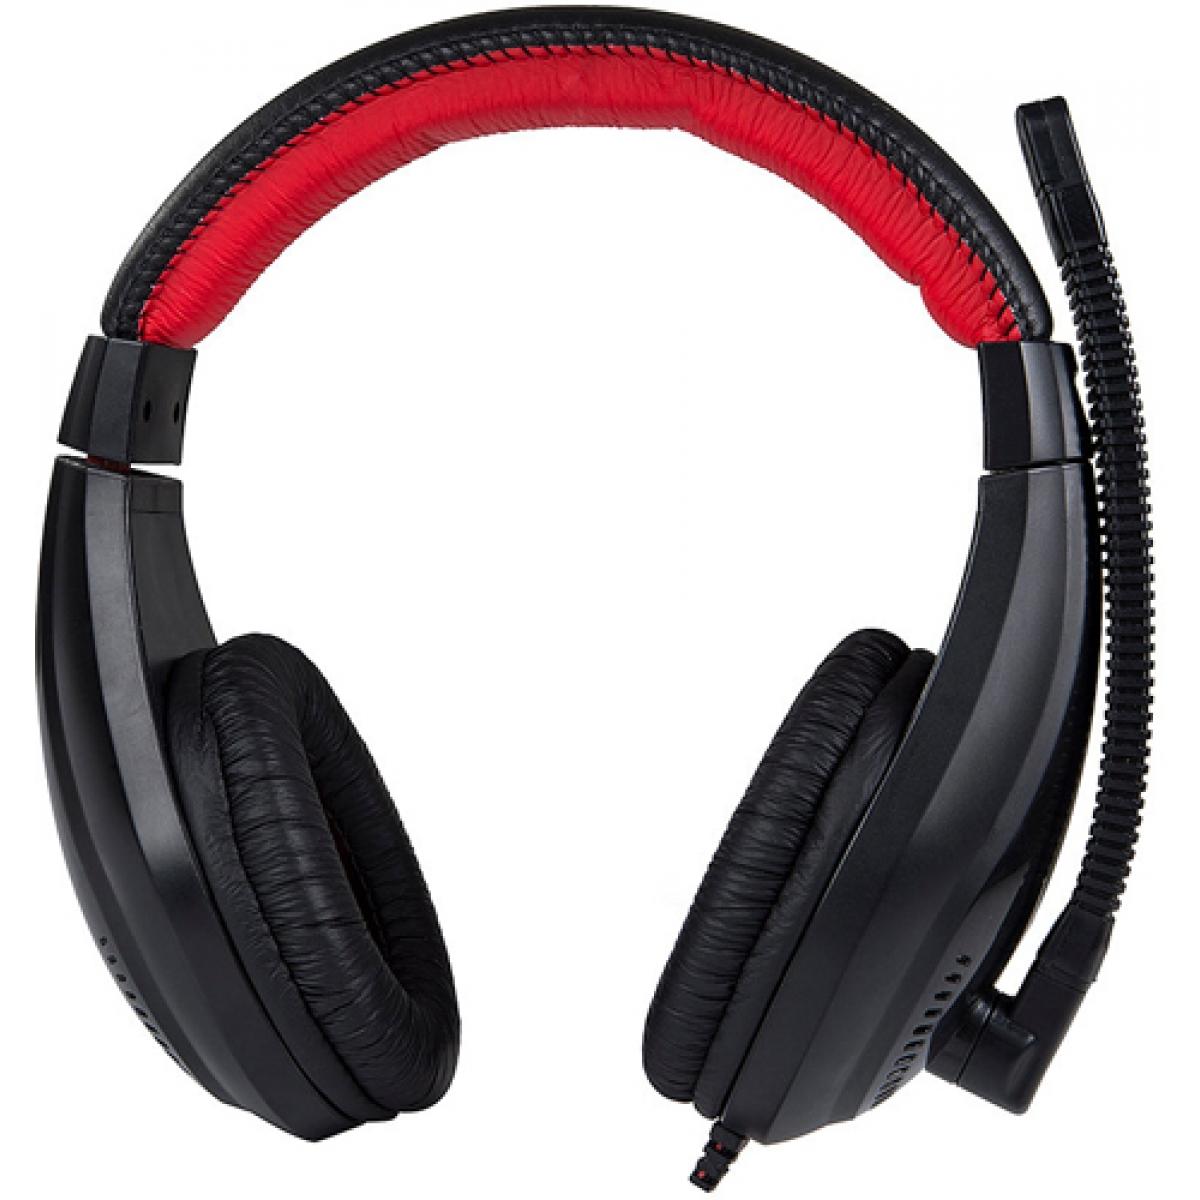 Headset Gamer Marvo Scorpion H8320 Preto